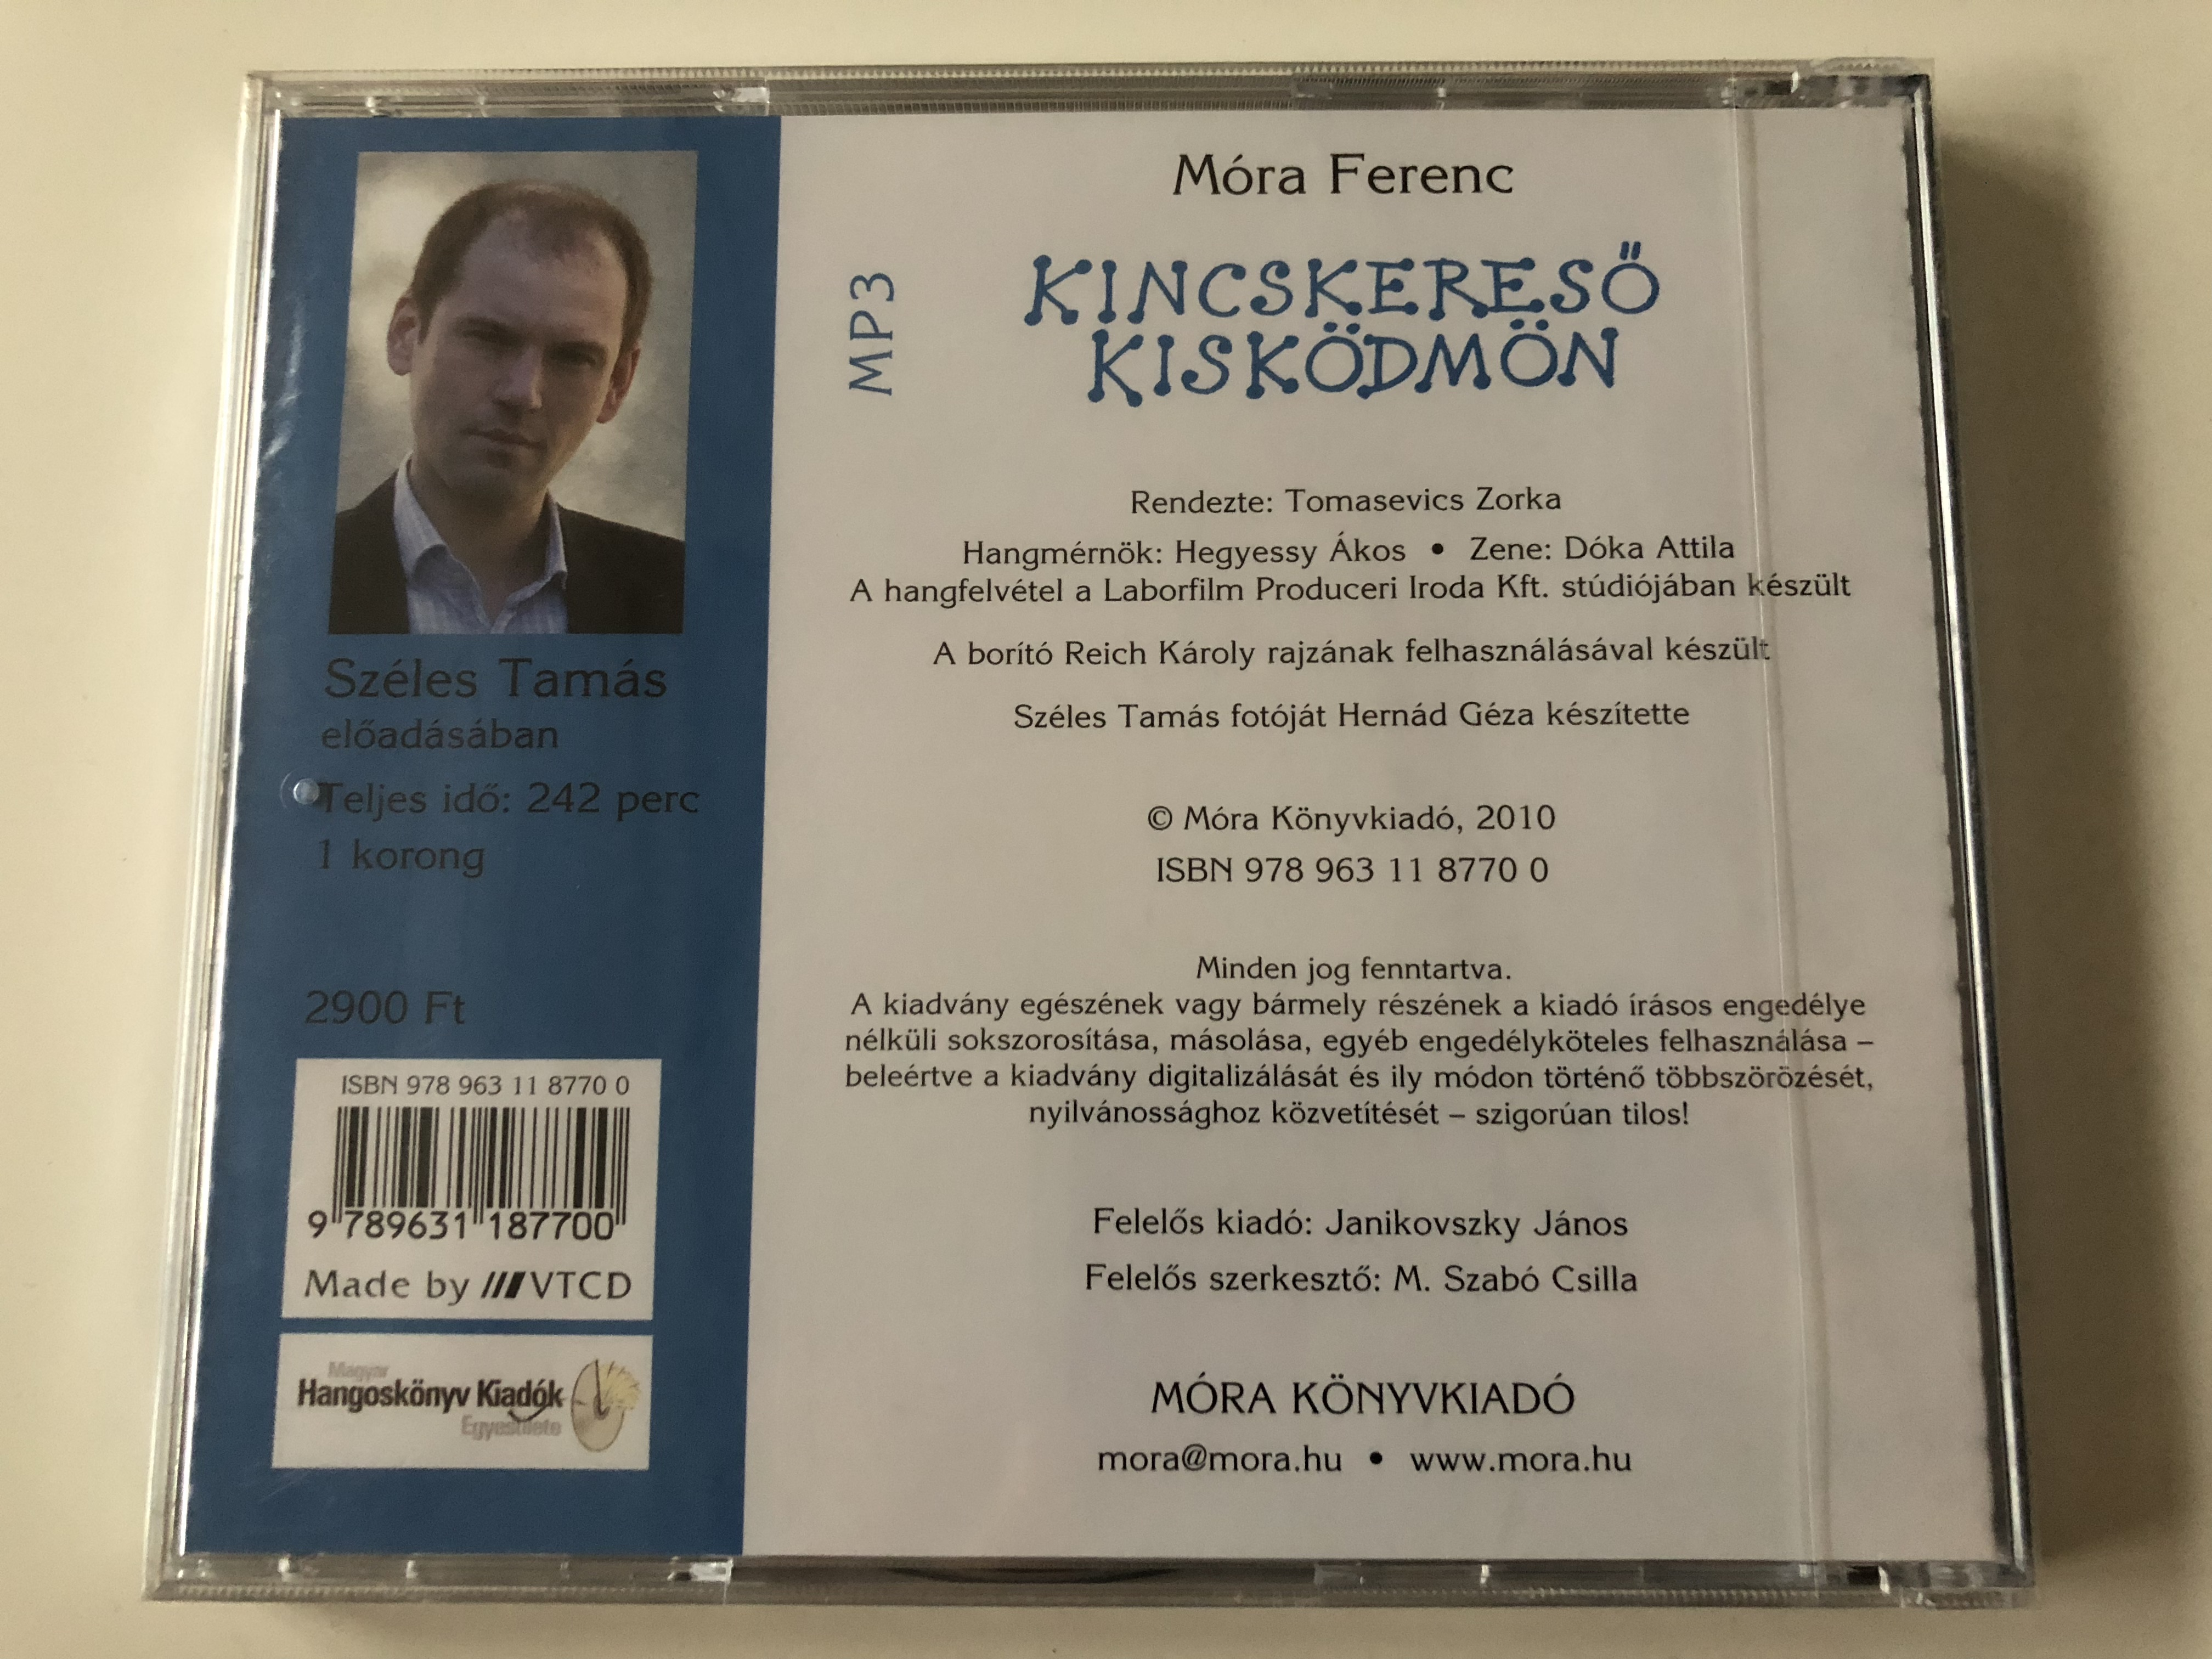 kincskeres-kisk-dm-n-by-m-ra-ferenc-hungarian-language-mp3-audio-book-read-by-sz-les-tam-s-m-ra-k-nyvkiad-2010-2-.jpg